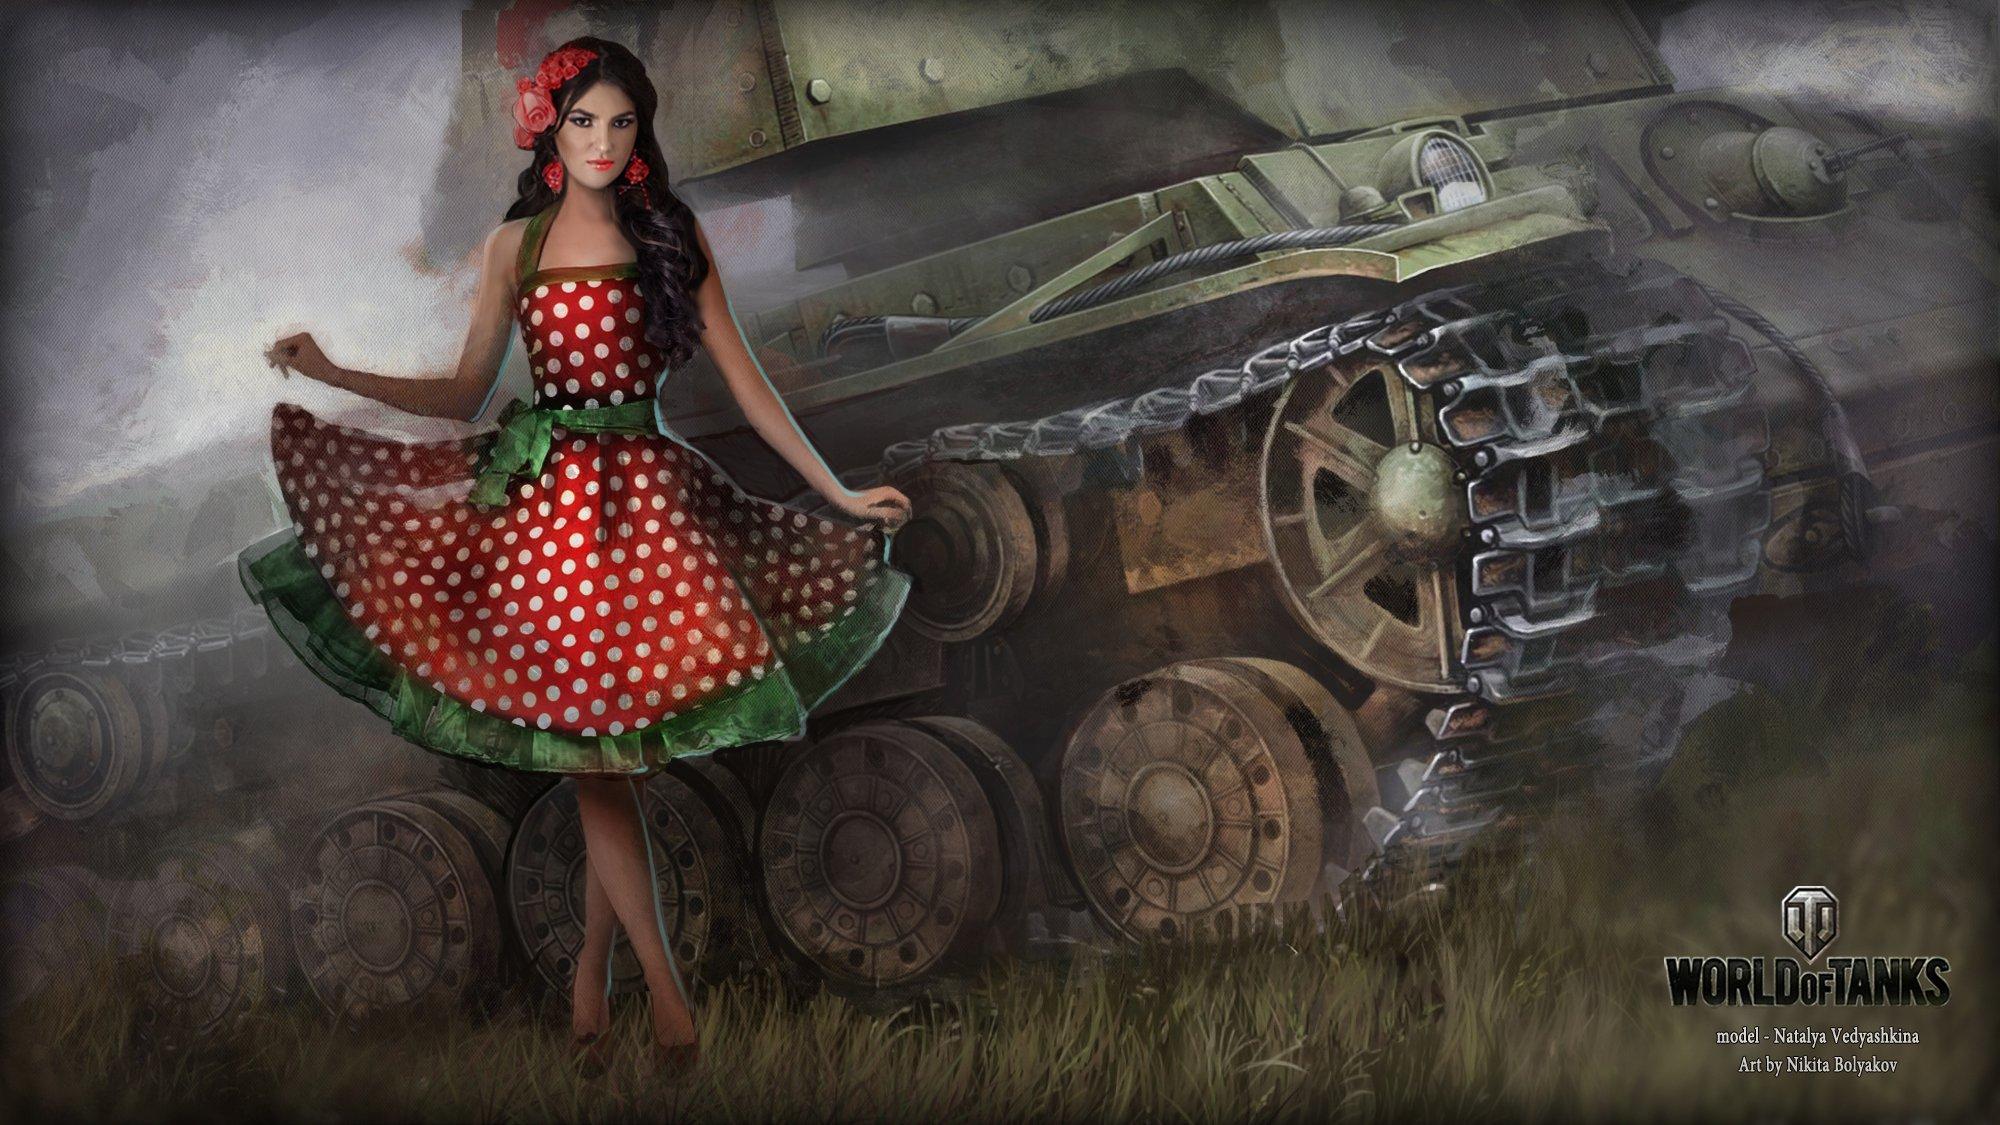 обои на рабочий стол танки world of tanks девушки № 204936 загрузить